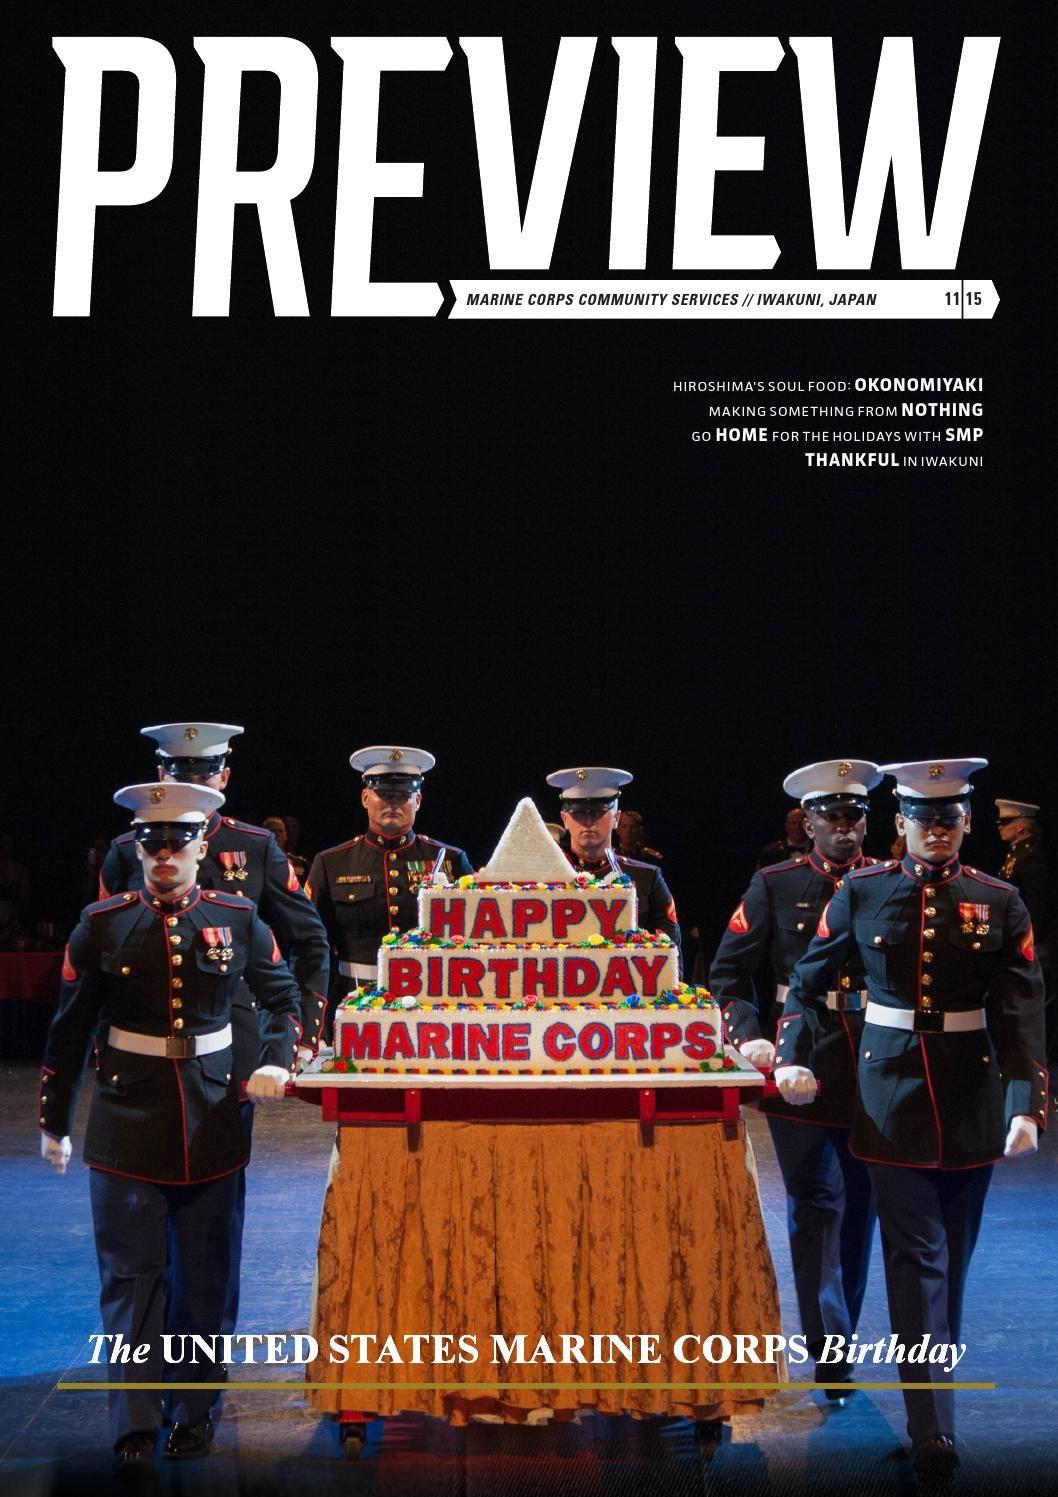 Preview November 2015 Happy birthday marines, Marine